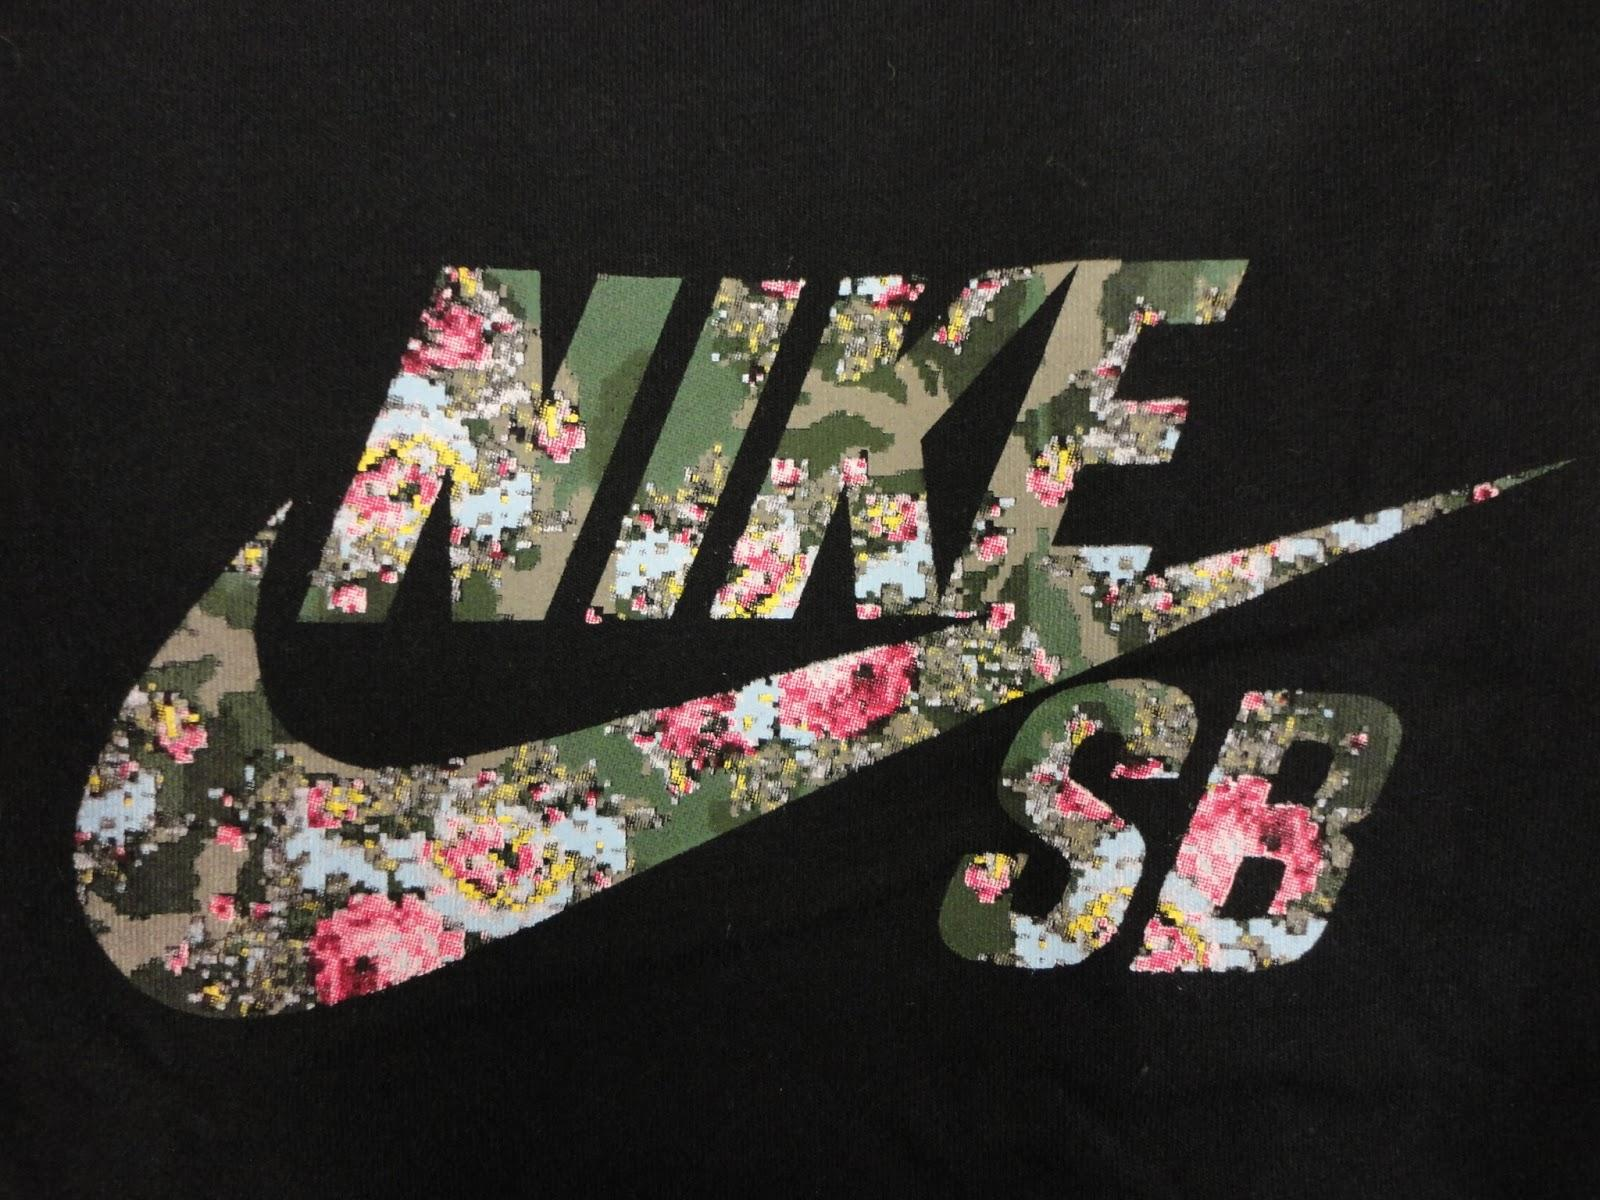 Floral Nike Desktop Wallpapers Wallpaper Cave